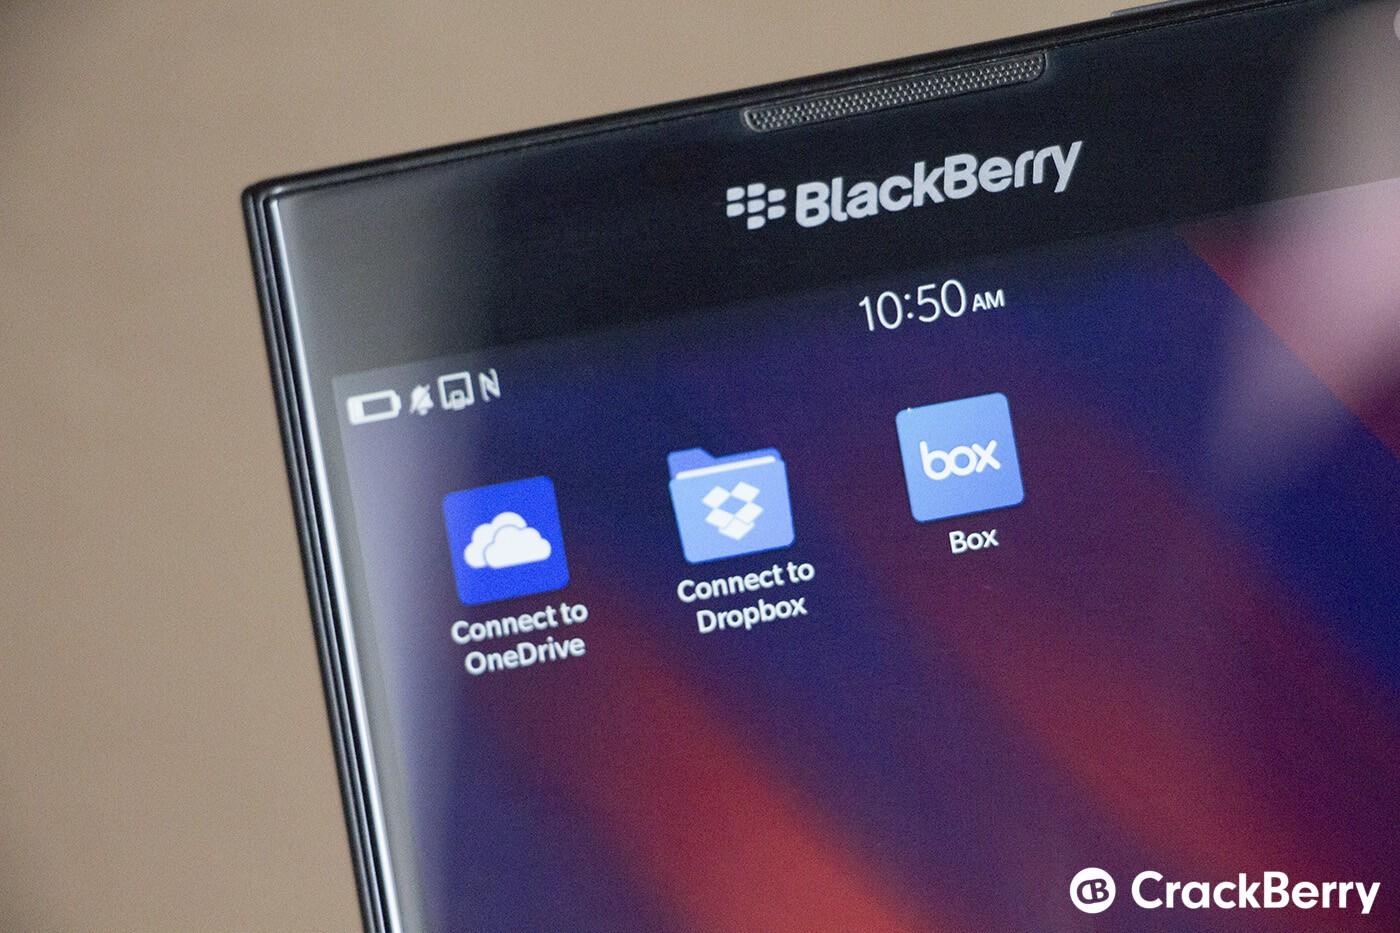 my phone explorer per blackberry